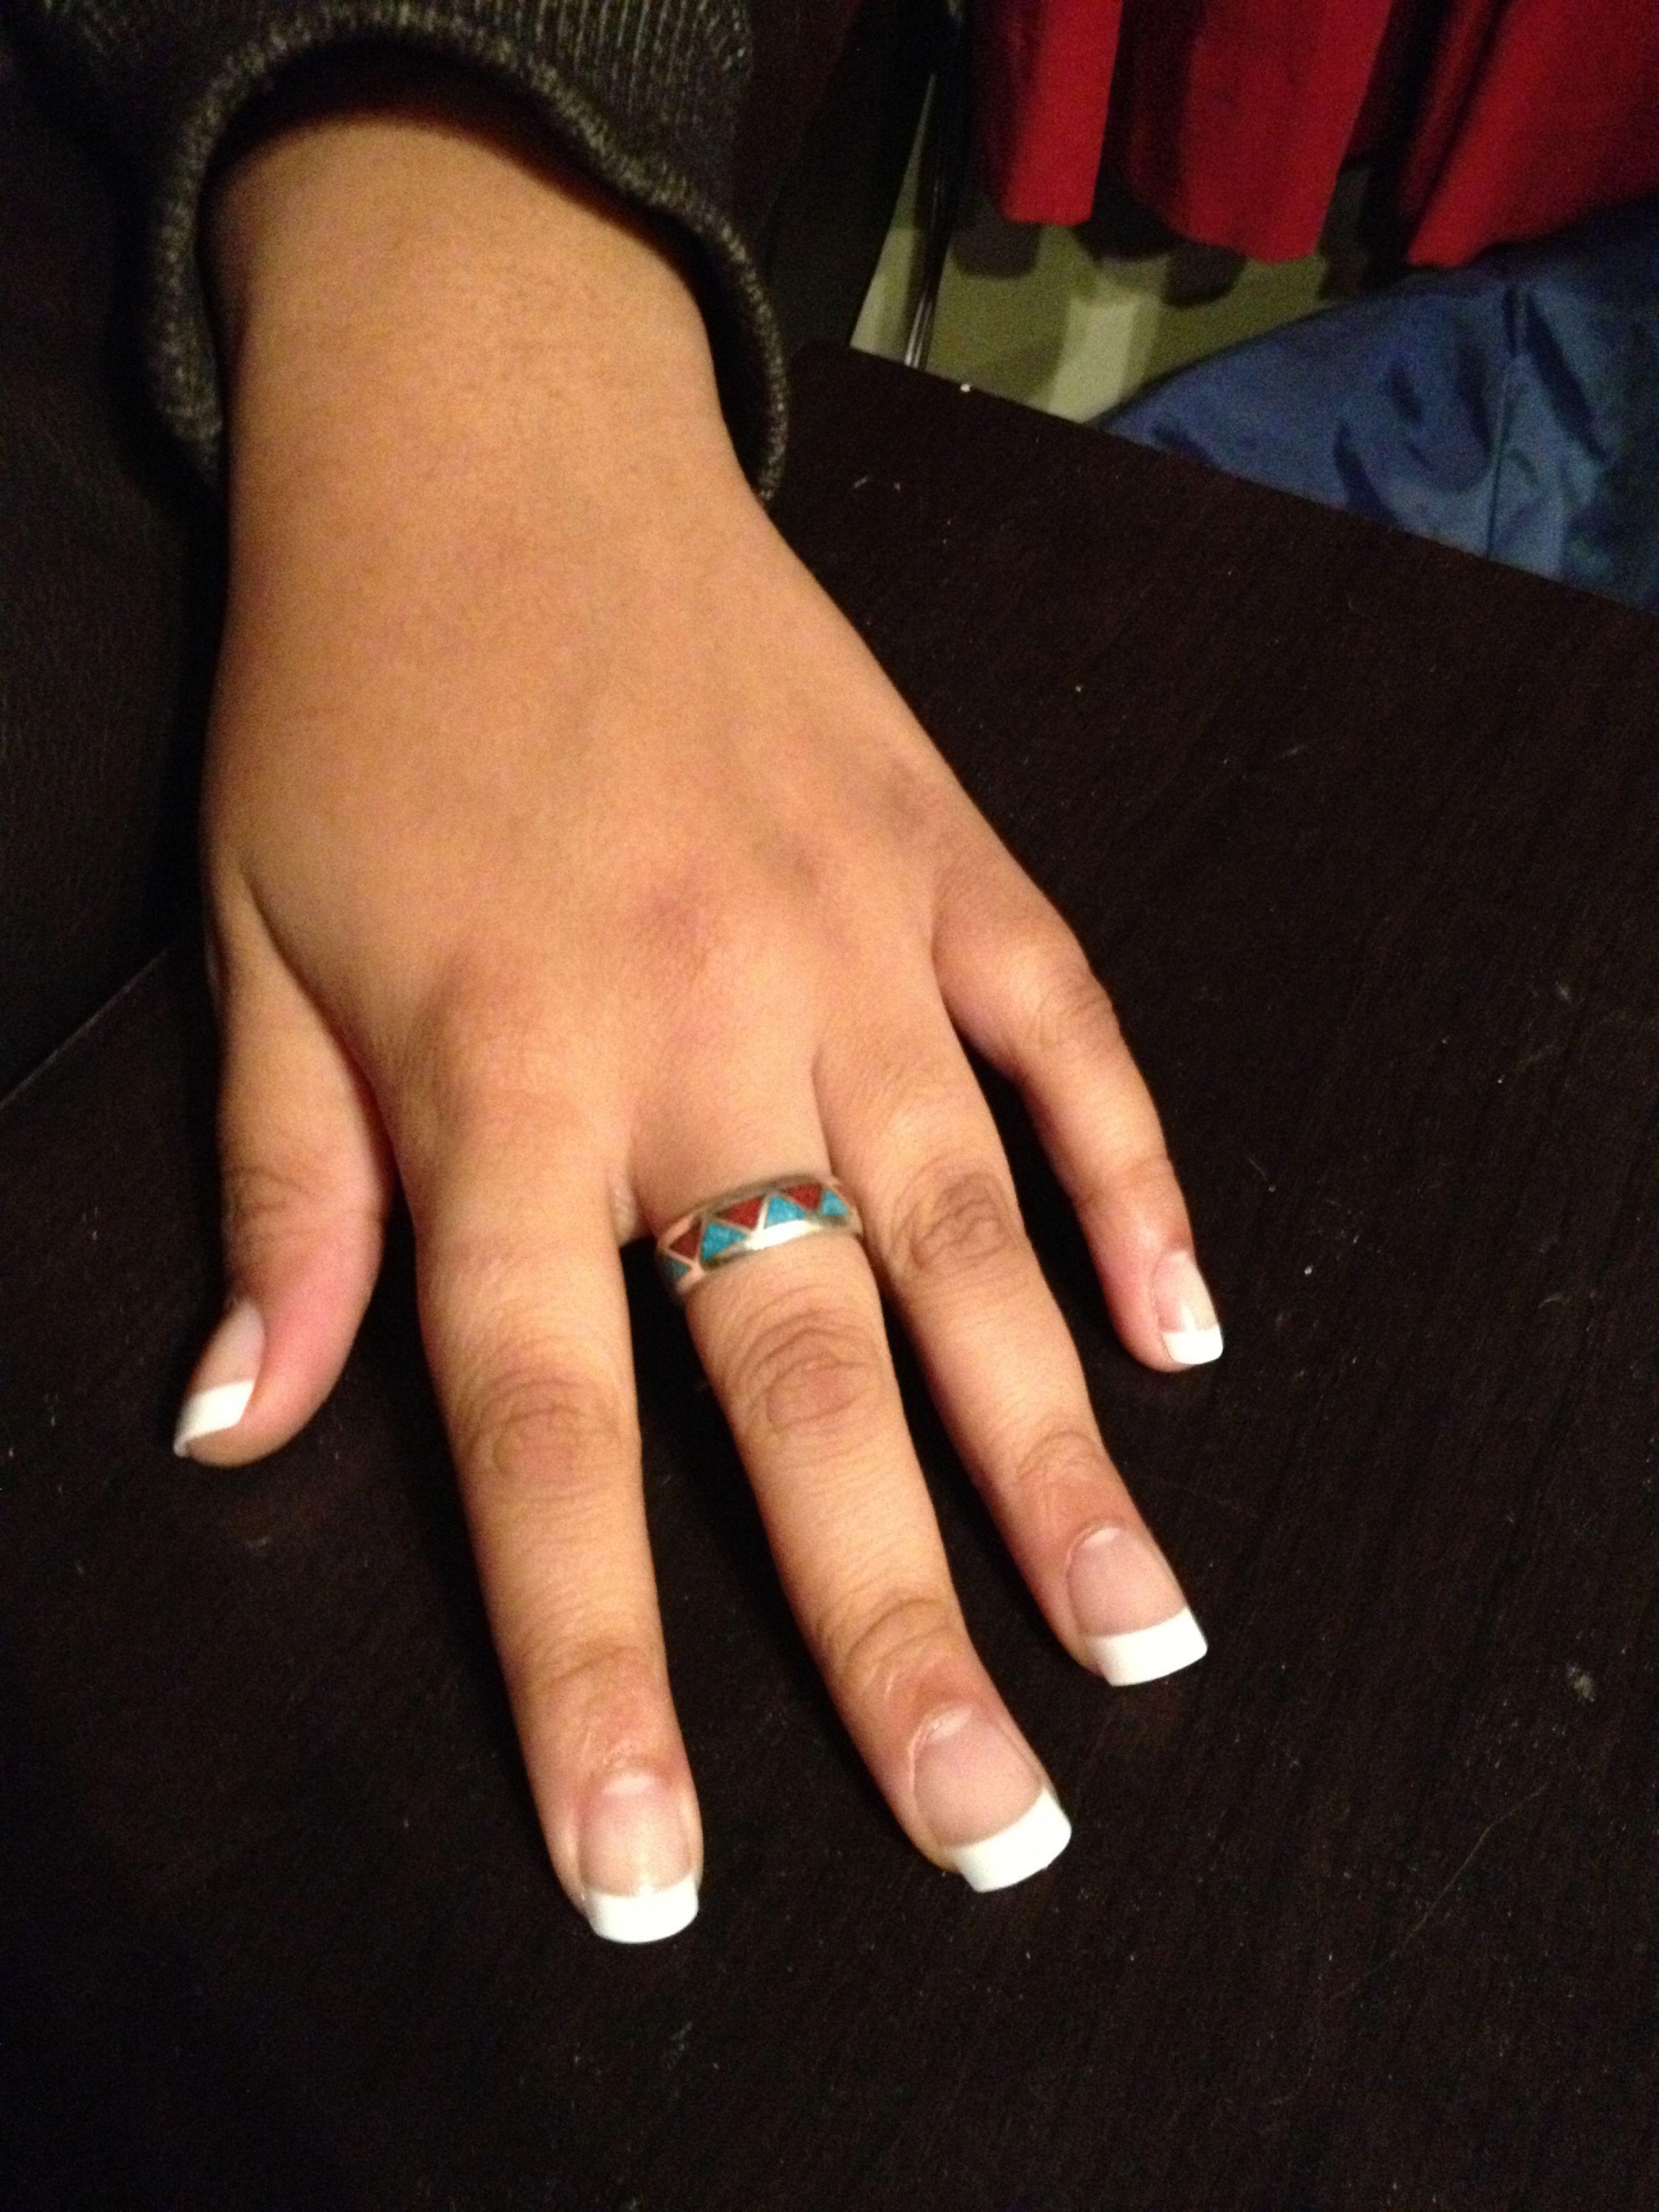 Does Family Dollar supply nail glue for fake nails